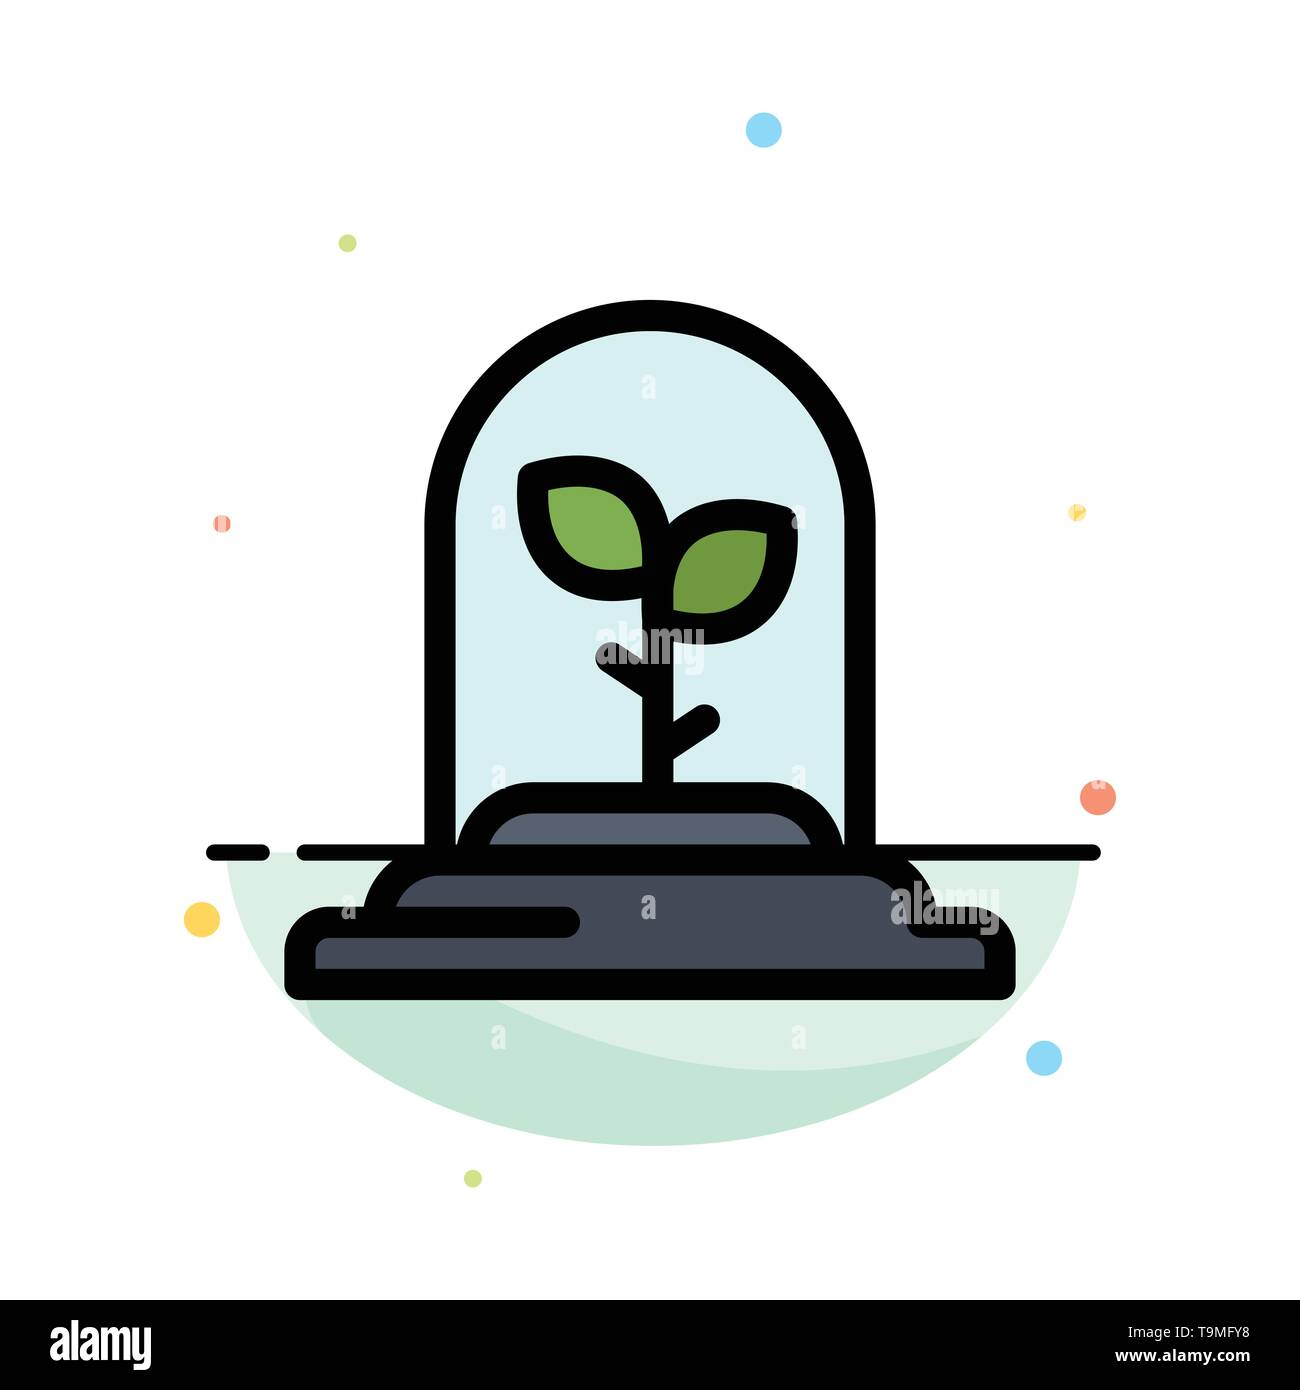 Technologie, Blatt, Pflanze Abstrakte flachen Farbe Symbol Vorlage Stockbild